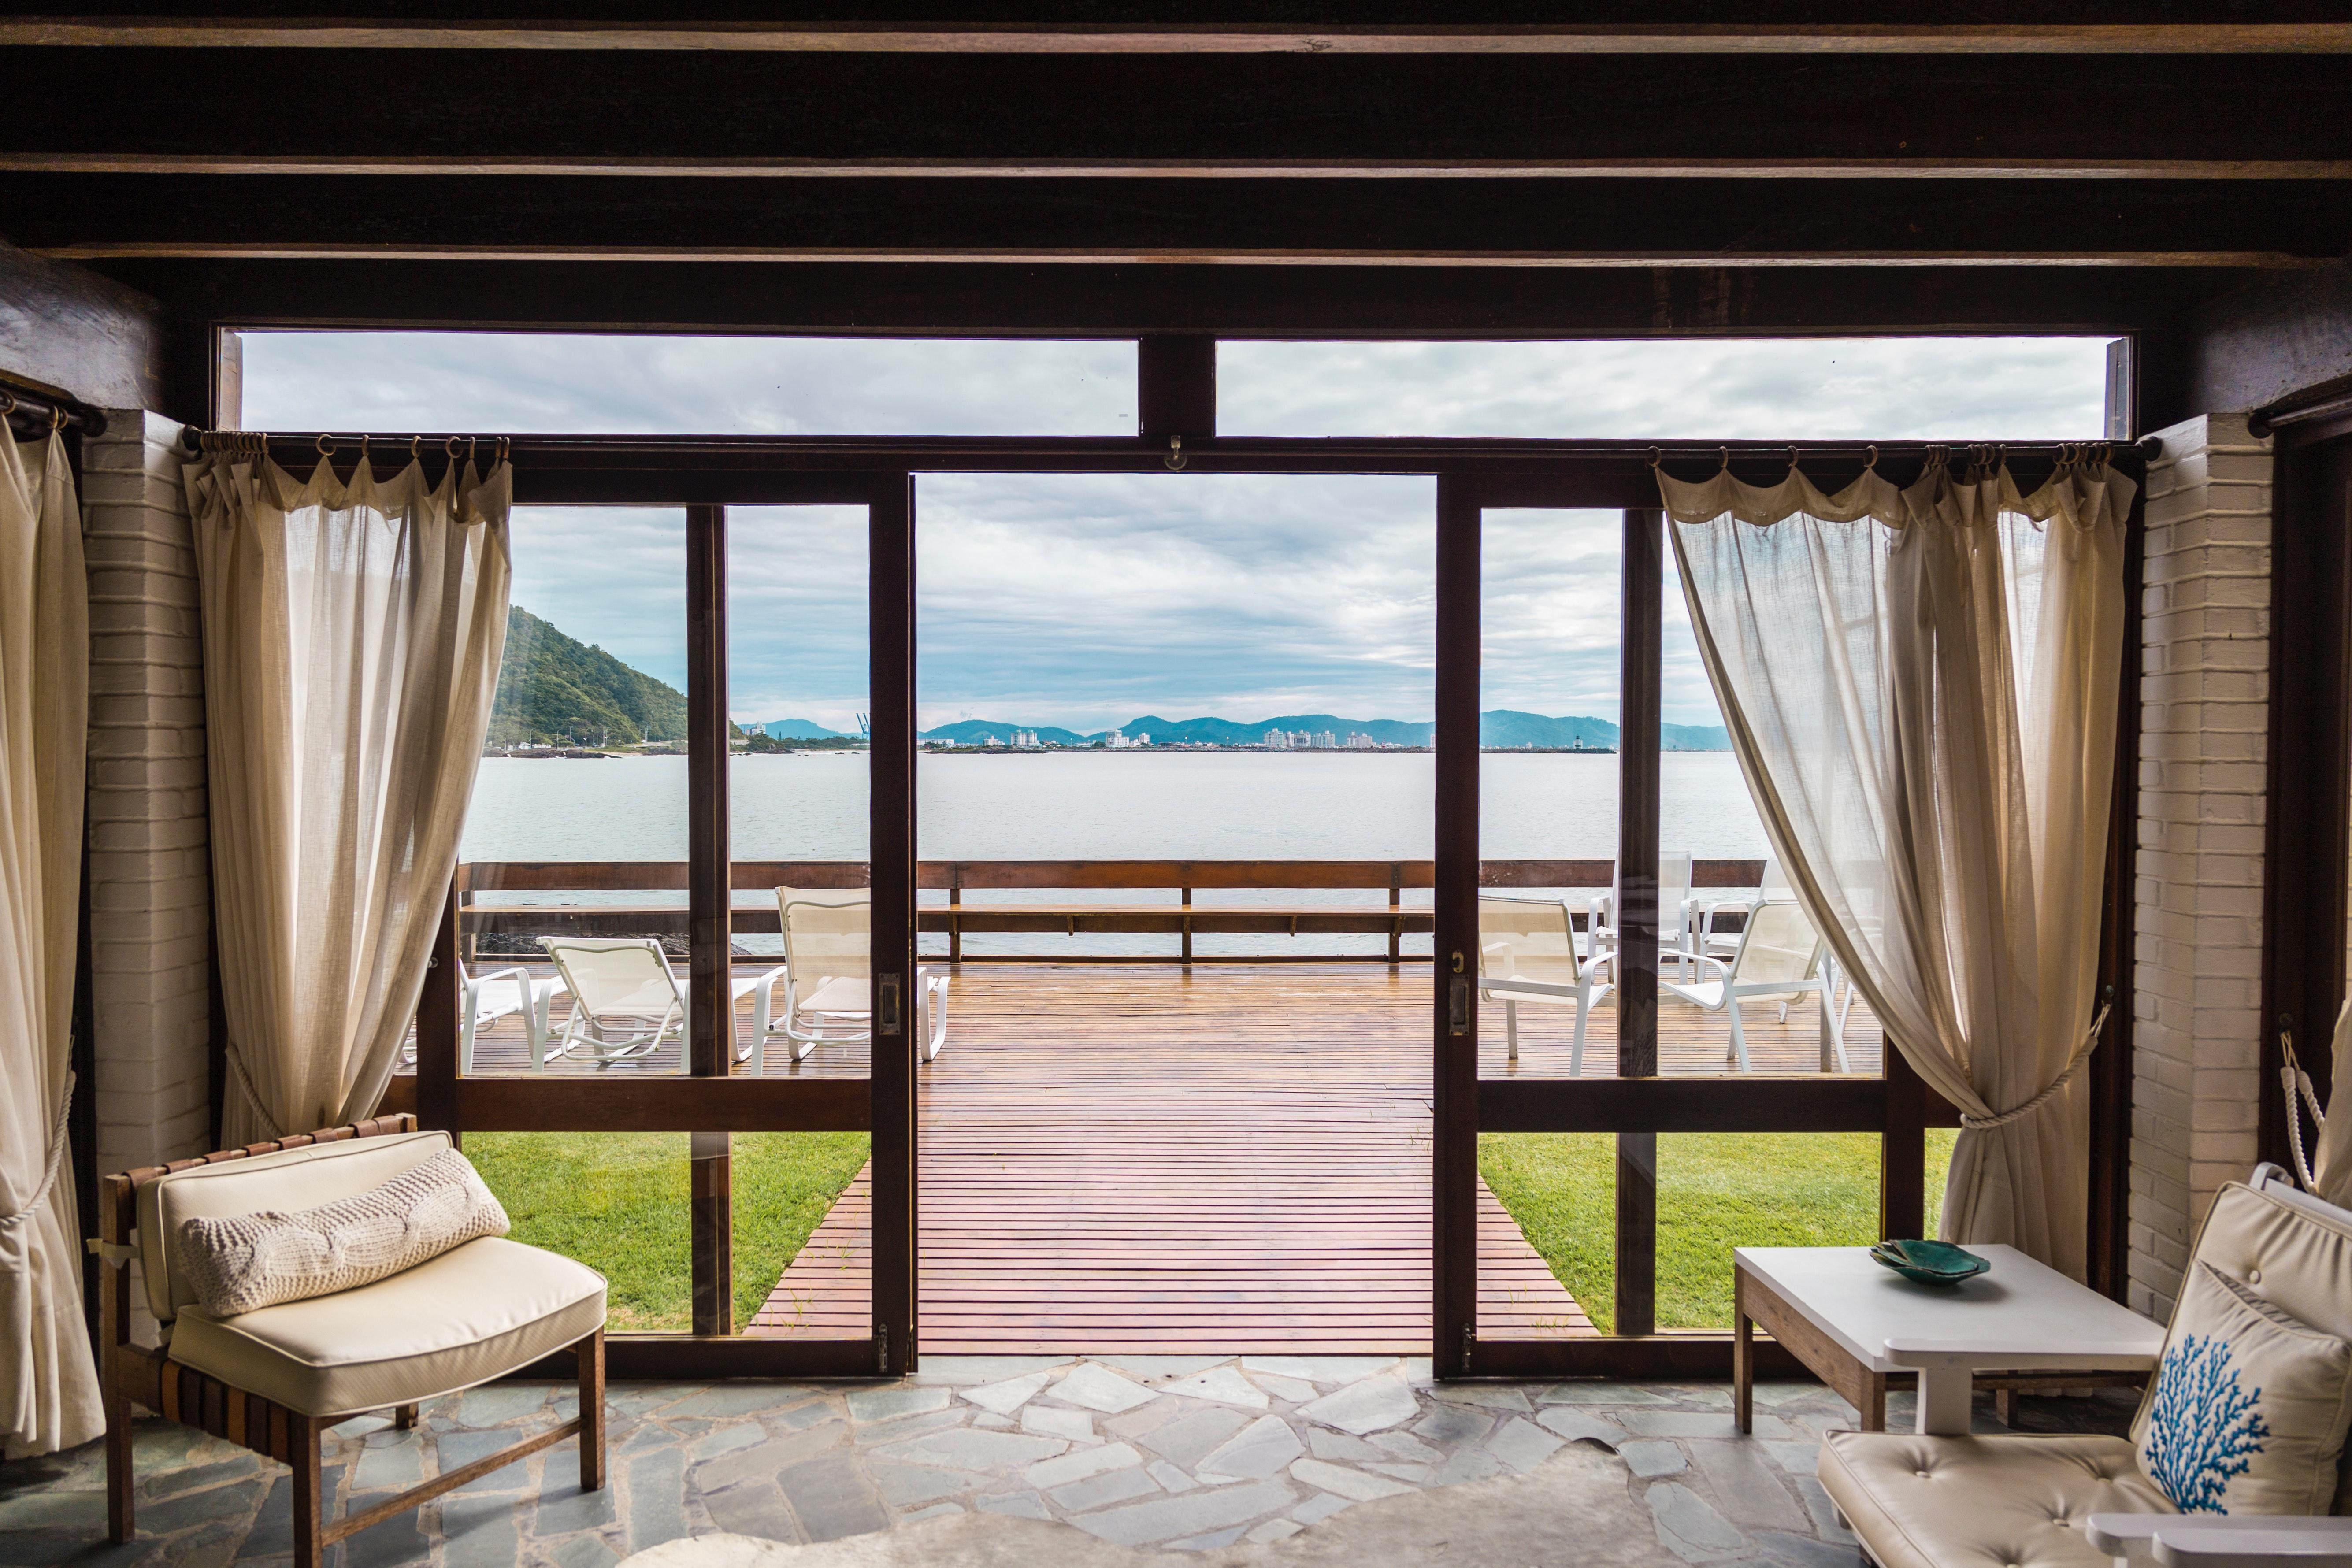 architecture-beach-beach-front-2598638